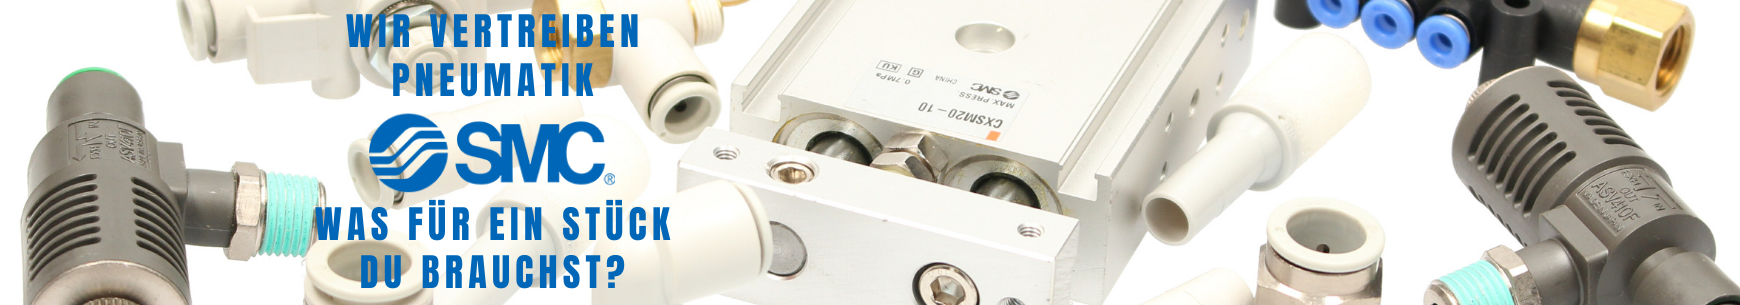 Pneumatik-SMC-Verteiler